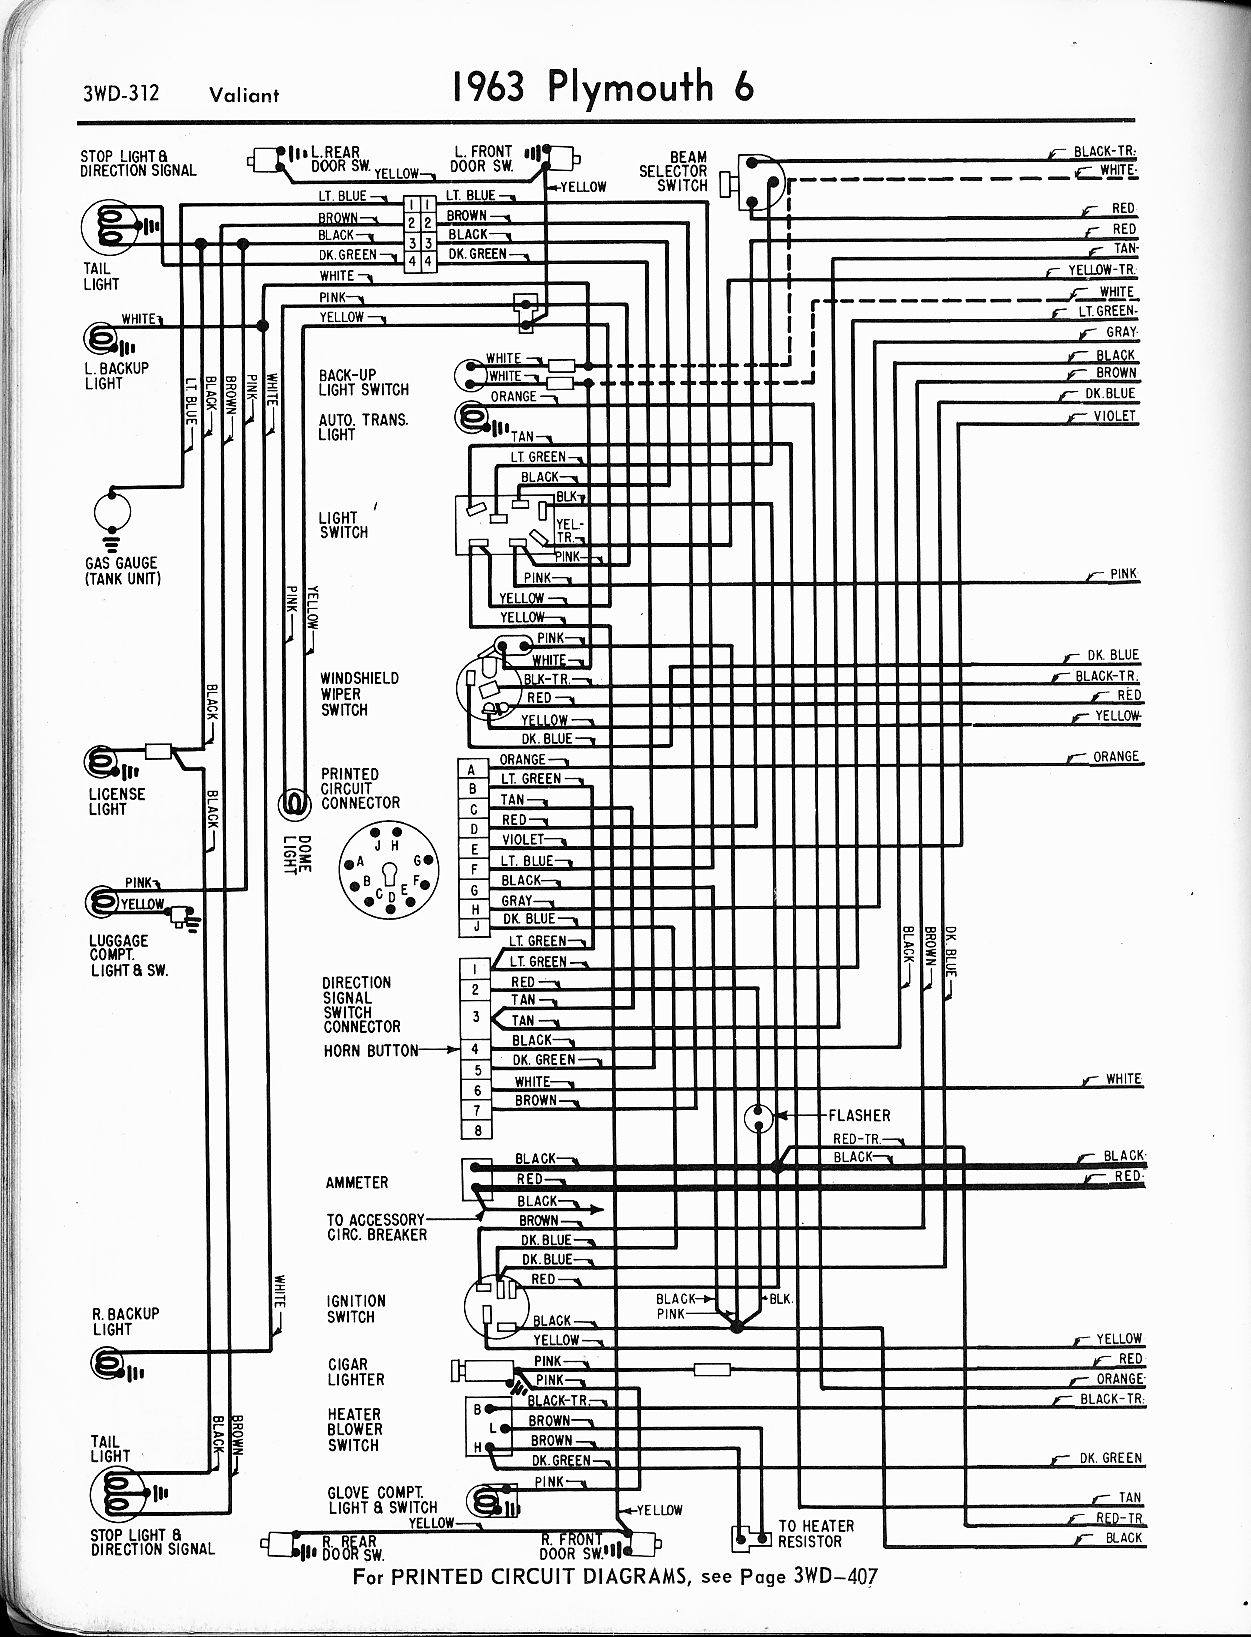 Wiring Diagrams 63 Model Year - Mopar Owners Group South Africa - Mopar Wiring Diagram